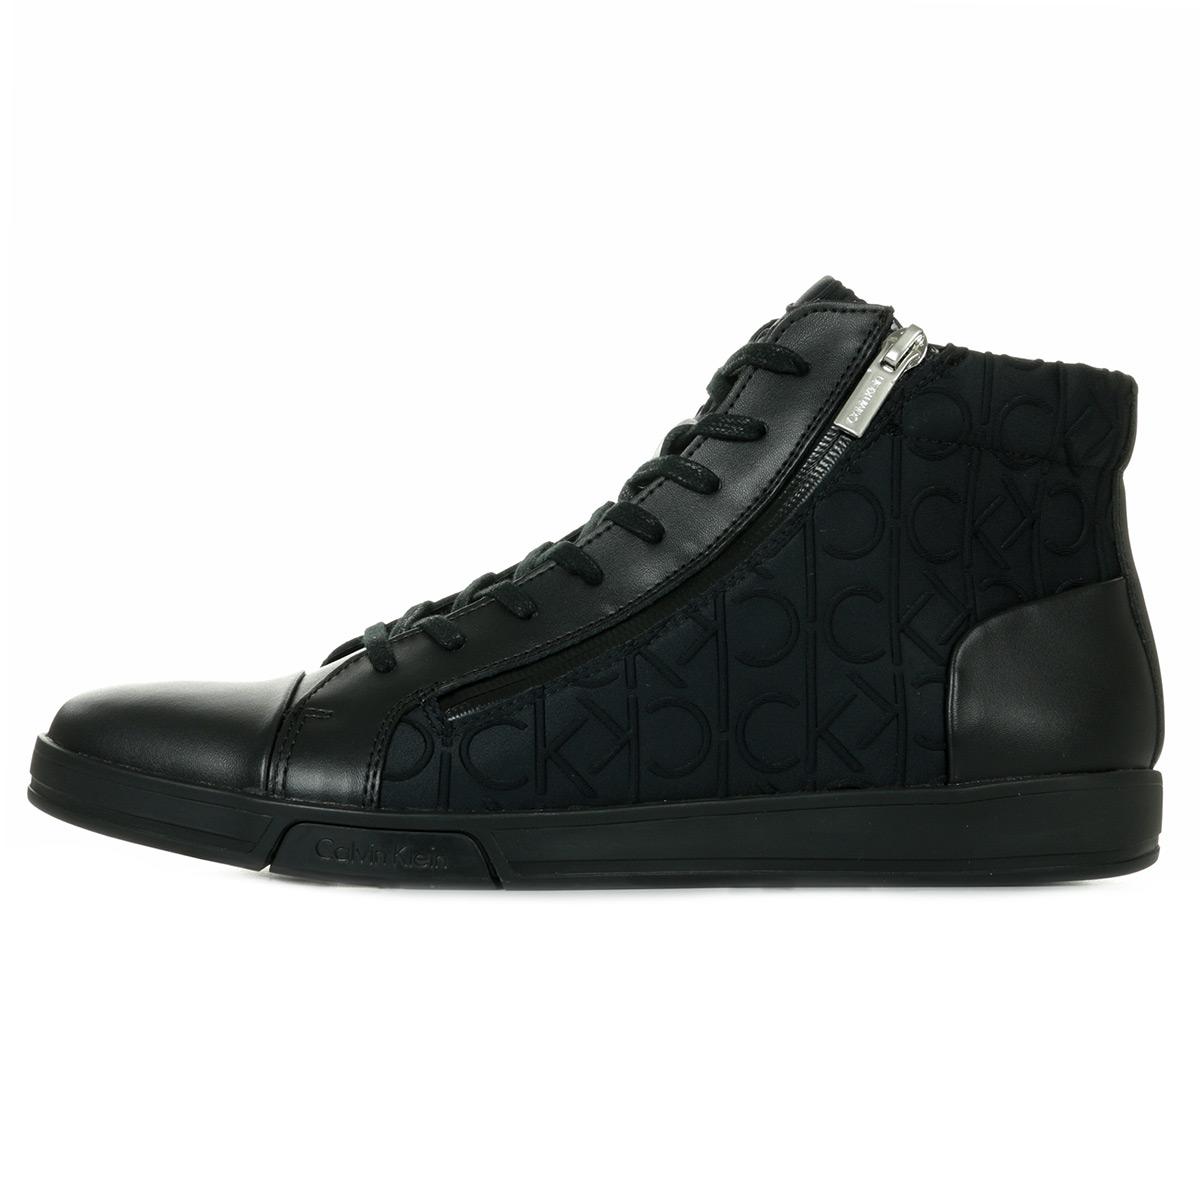 2b34b71688 Leath Klein Baskets Neop Berke homme Embos Brsh Chaussures Calvin Ck  xqFn6aqY